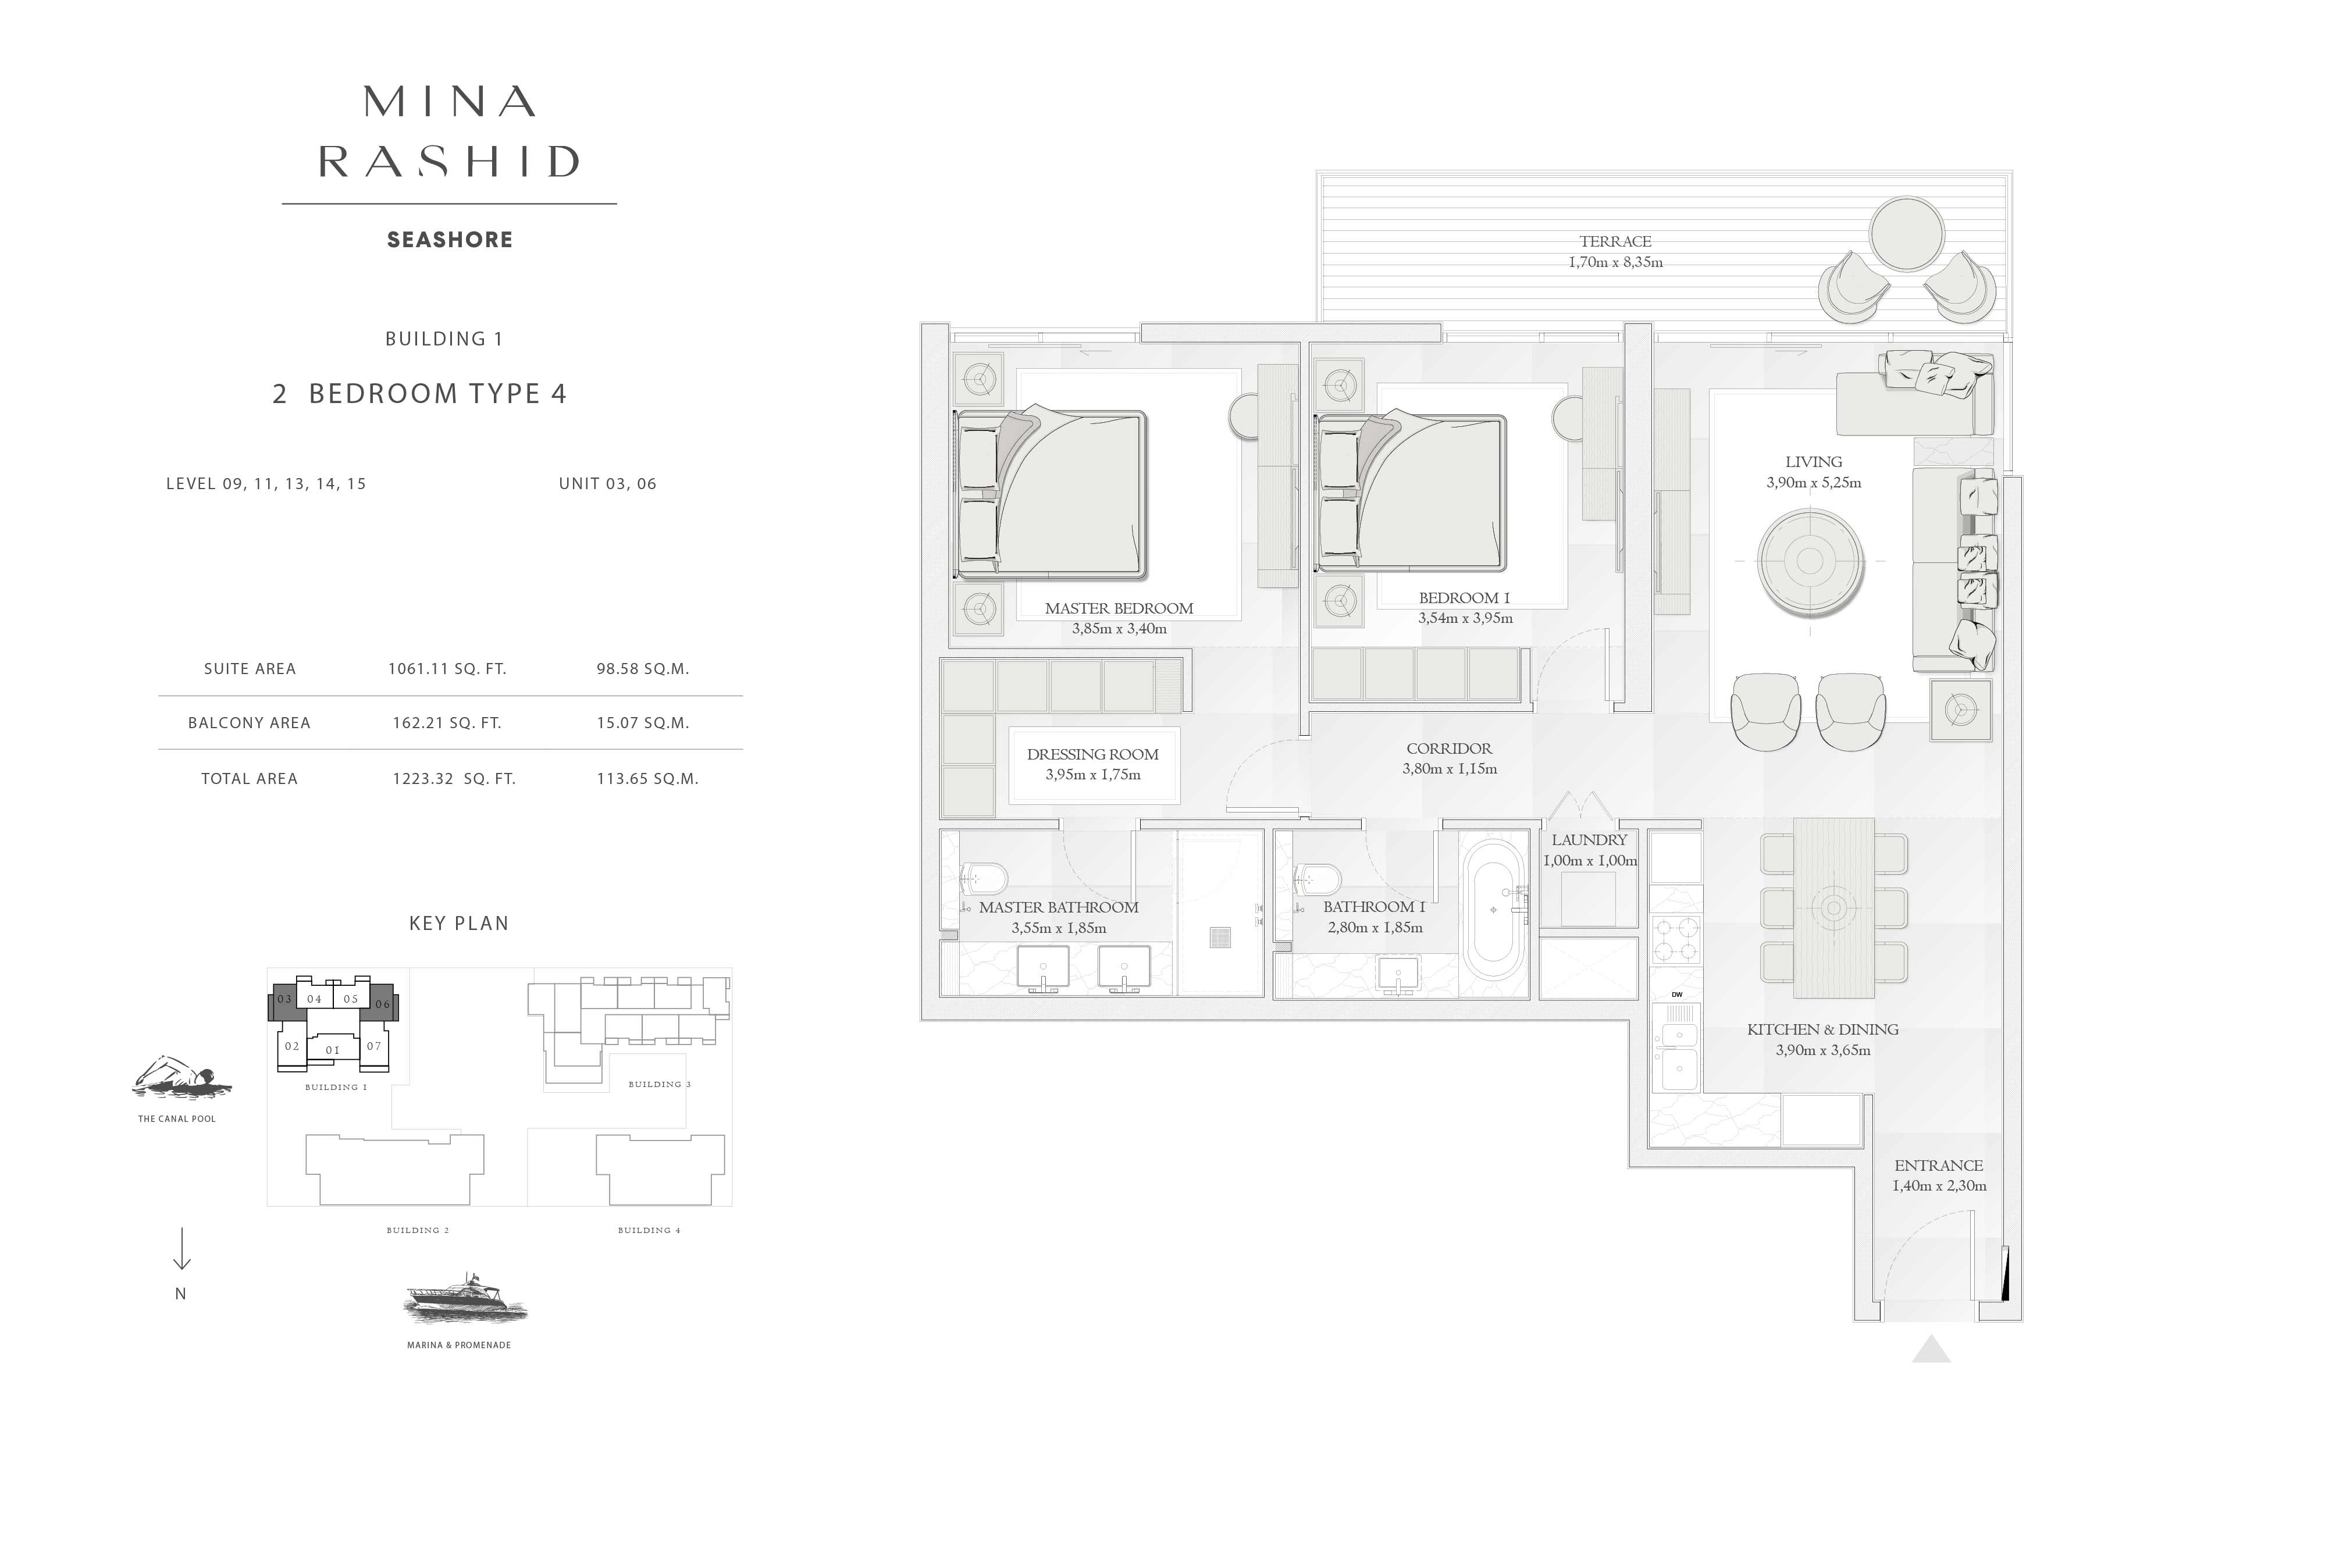 Building-1, 2-Bedroom-Type-4, Size-1233-Sq-Ft